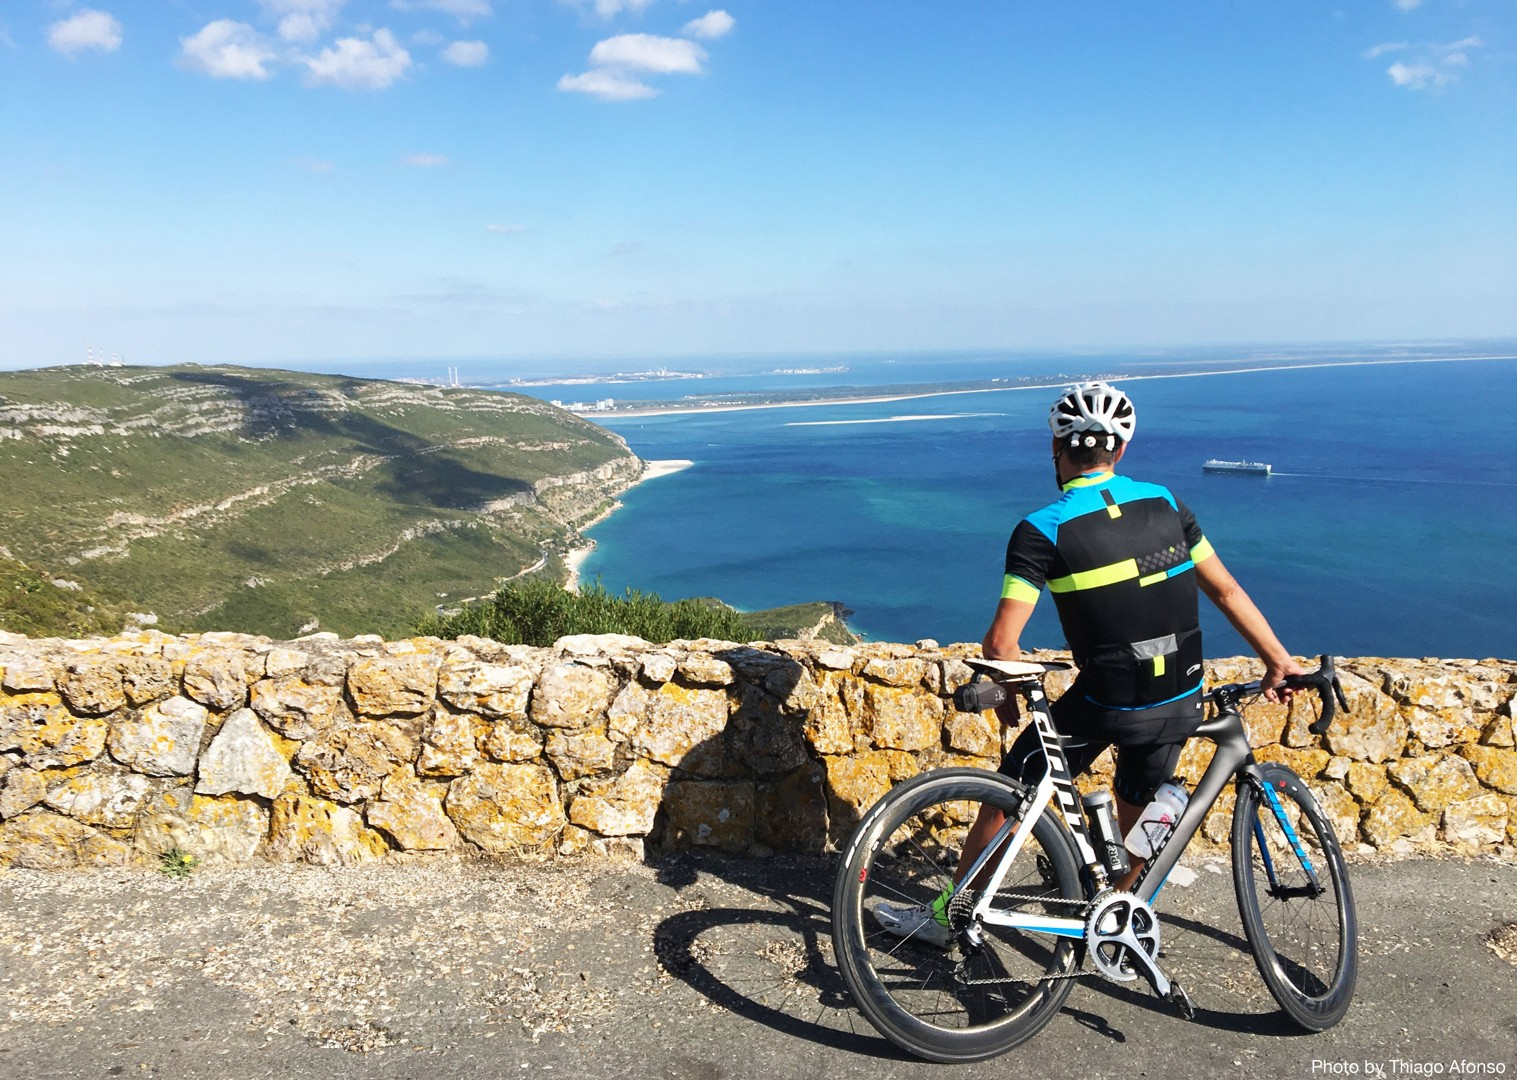 coastal-views-cycling-portugal.jpg - Portugal - Atlantic Escape - Guided Road Cycling Holiday - Road Cycling